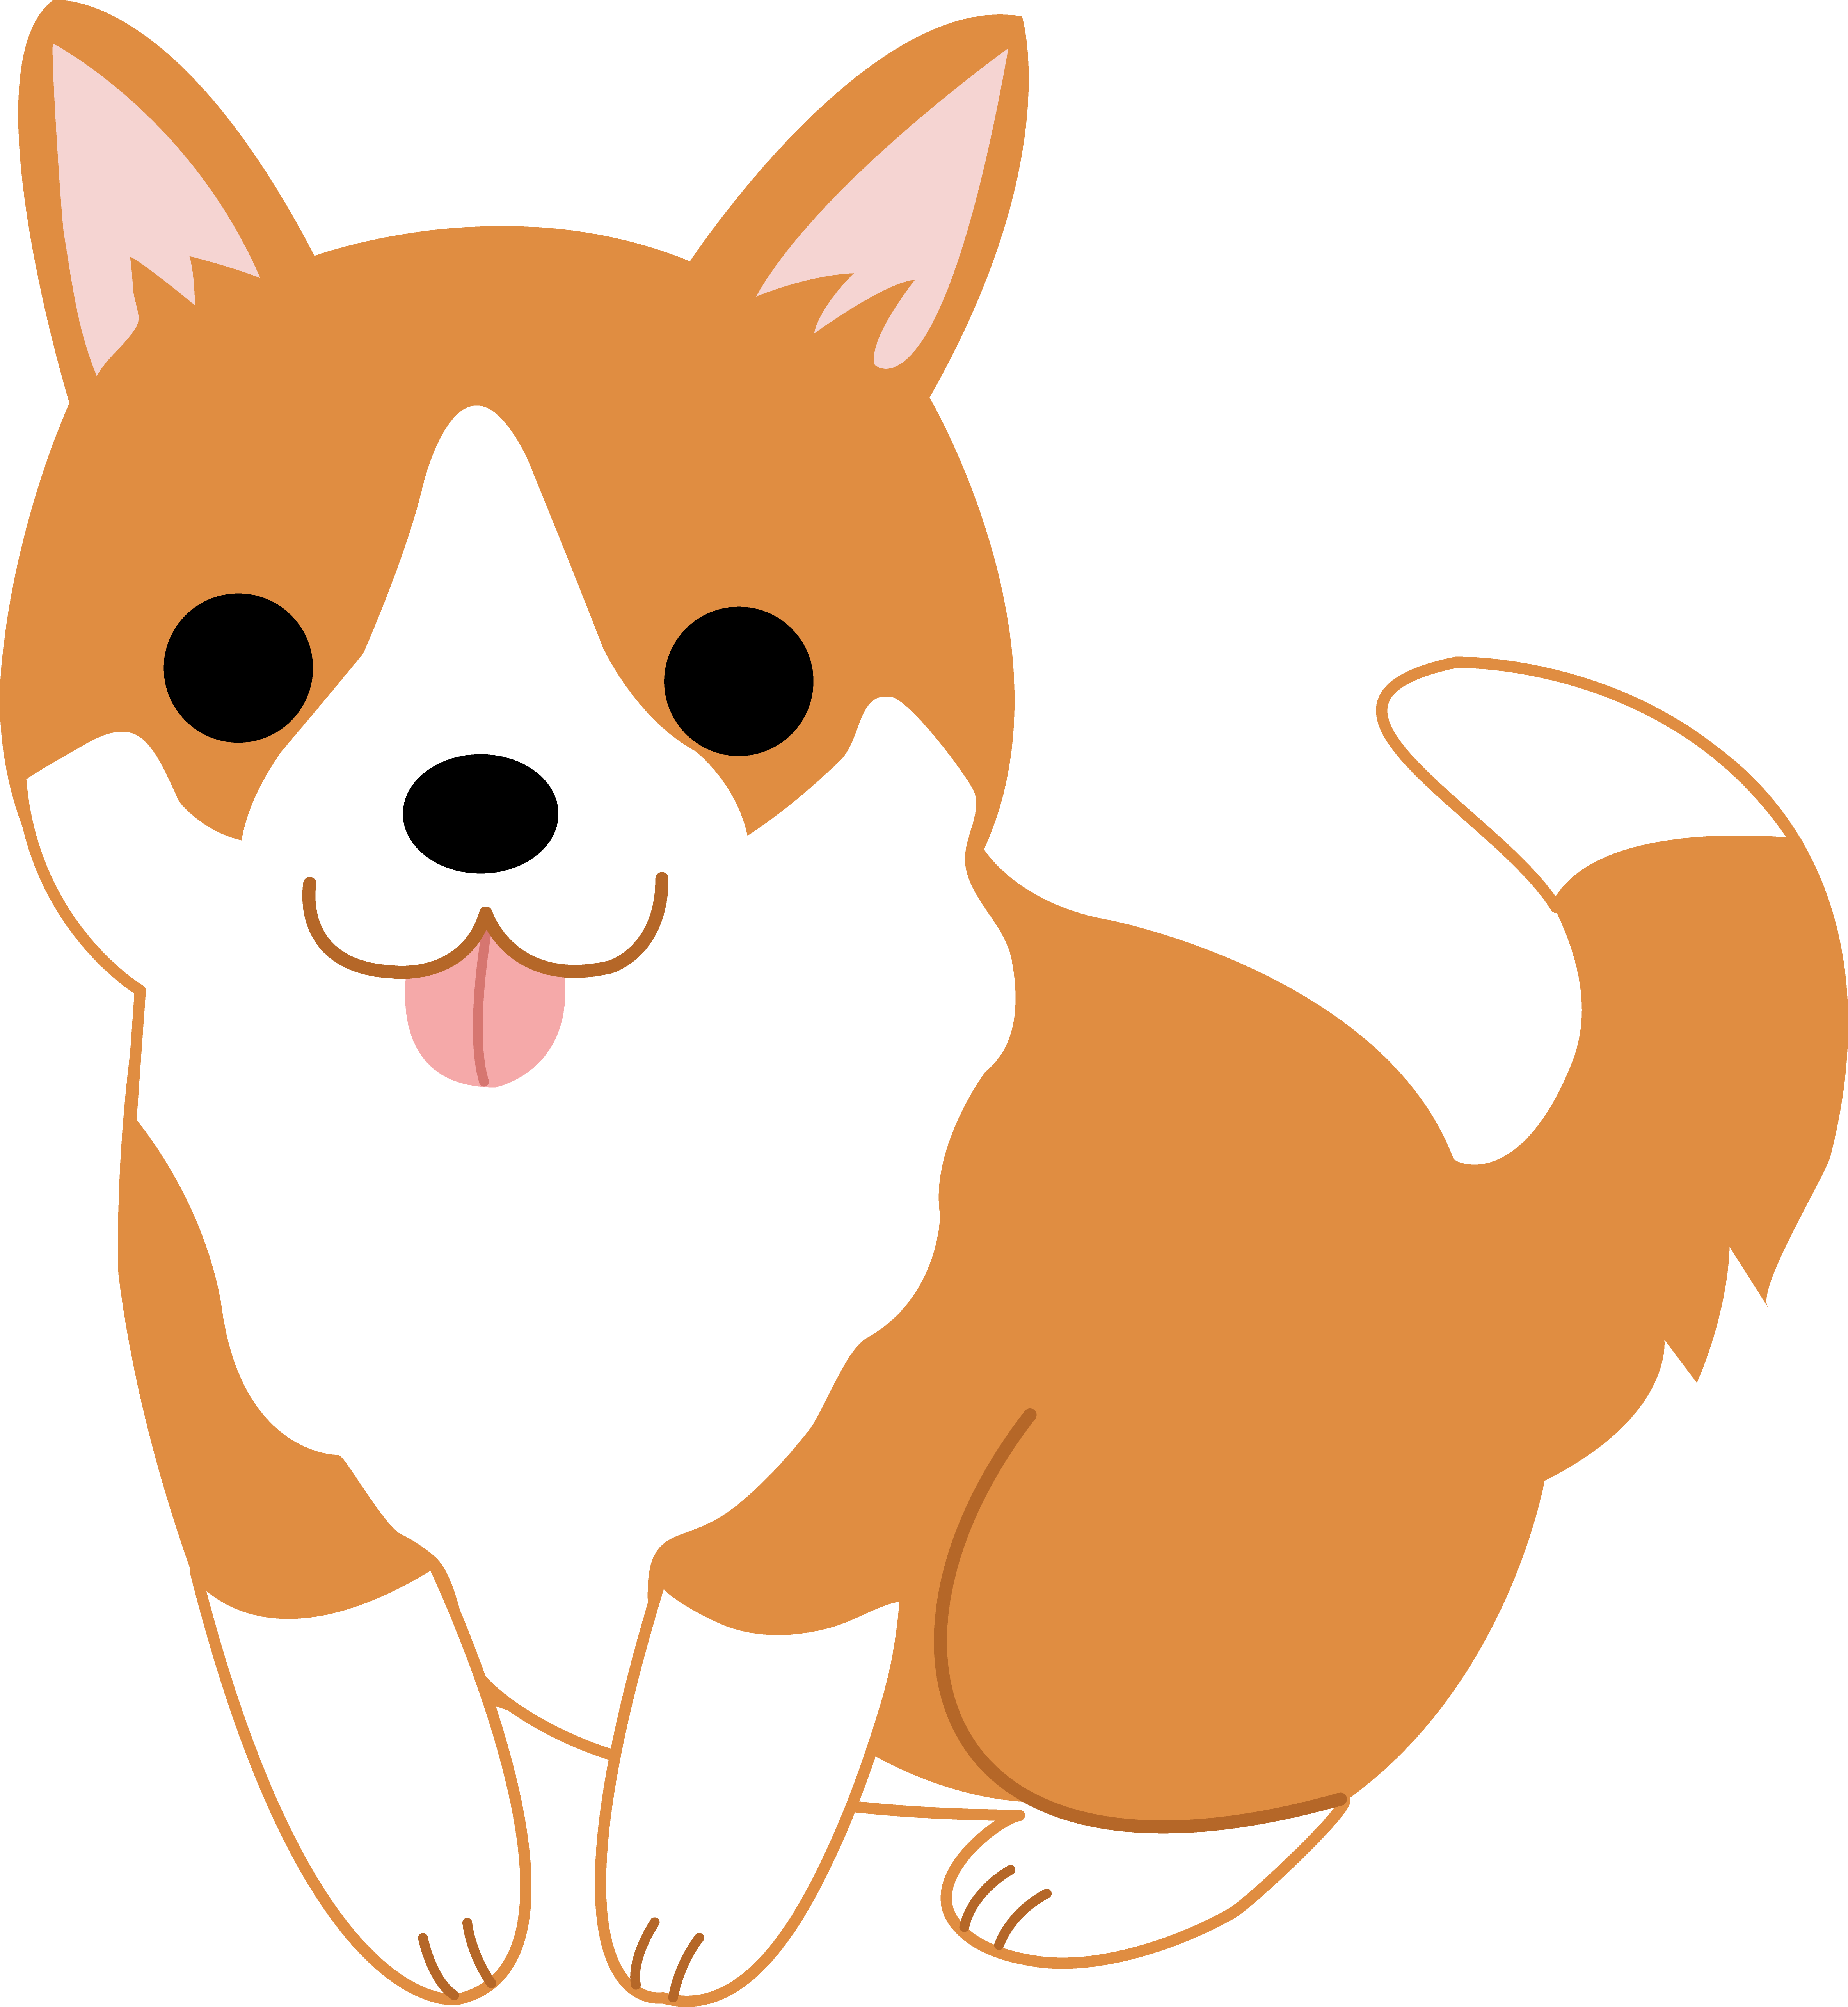 Kawaii dog clipart jpg stock 28+ Collection of Kawaii Dog Clipart | High quality, free cliparts ... jpg stock